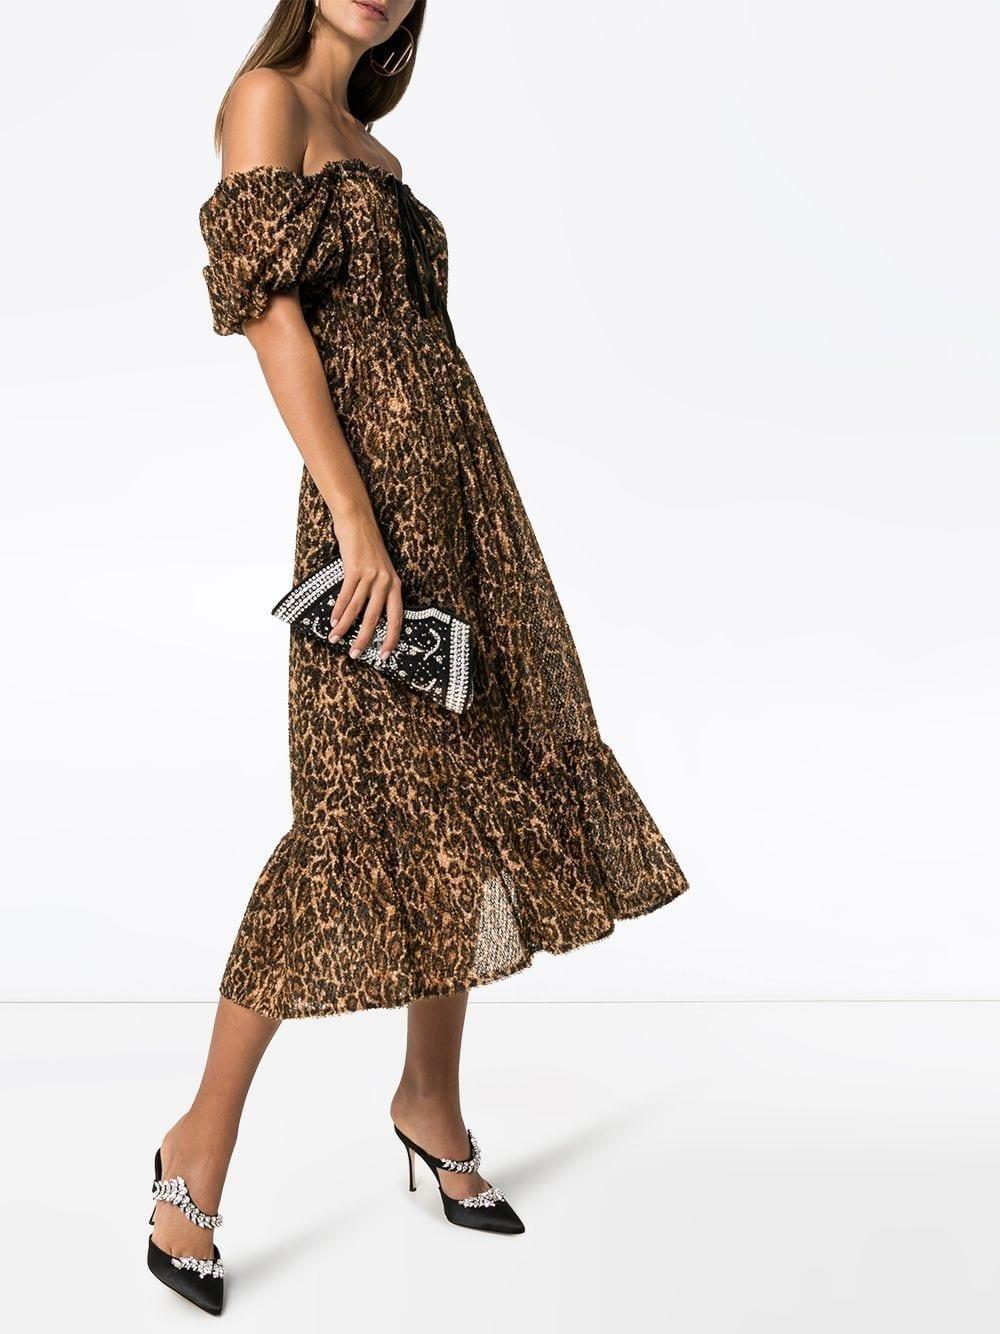 SHRIMPS Neptune Leopard Print Textured Midi Dress